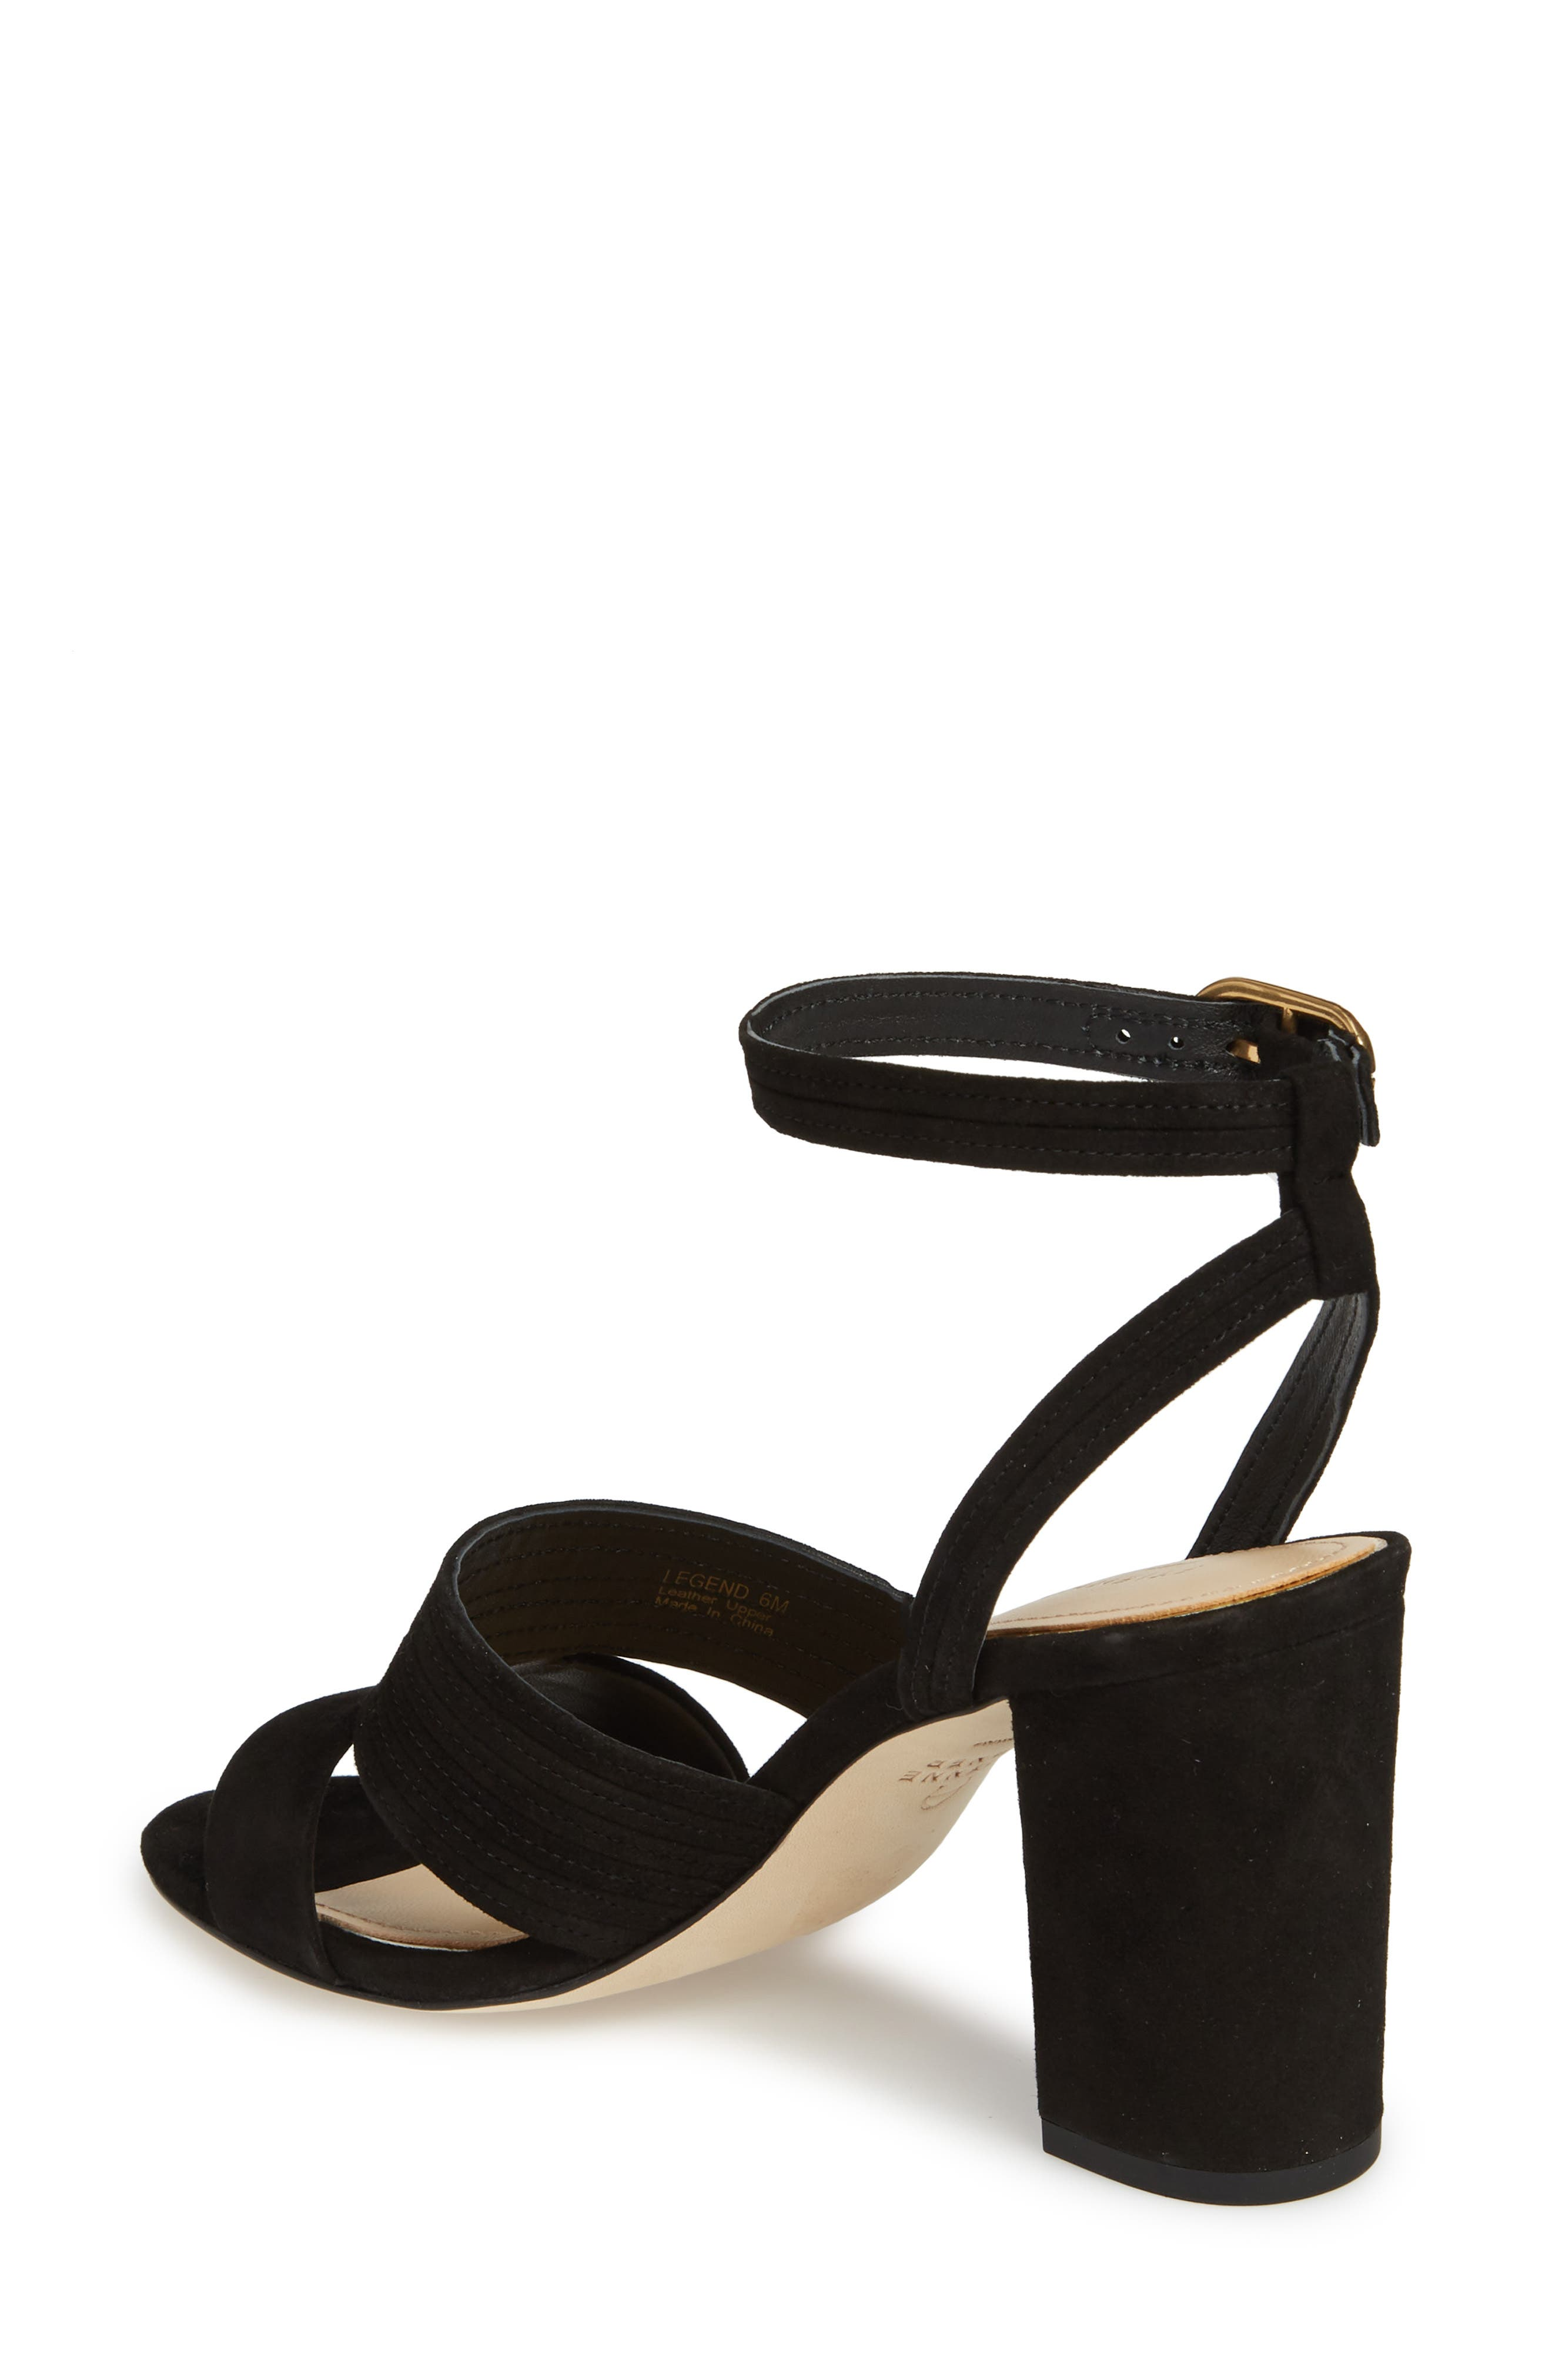 Legend Ankle Strap Sandal,                             Alternate thumbnail 2, color,                             BLACK SUEDE